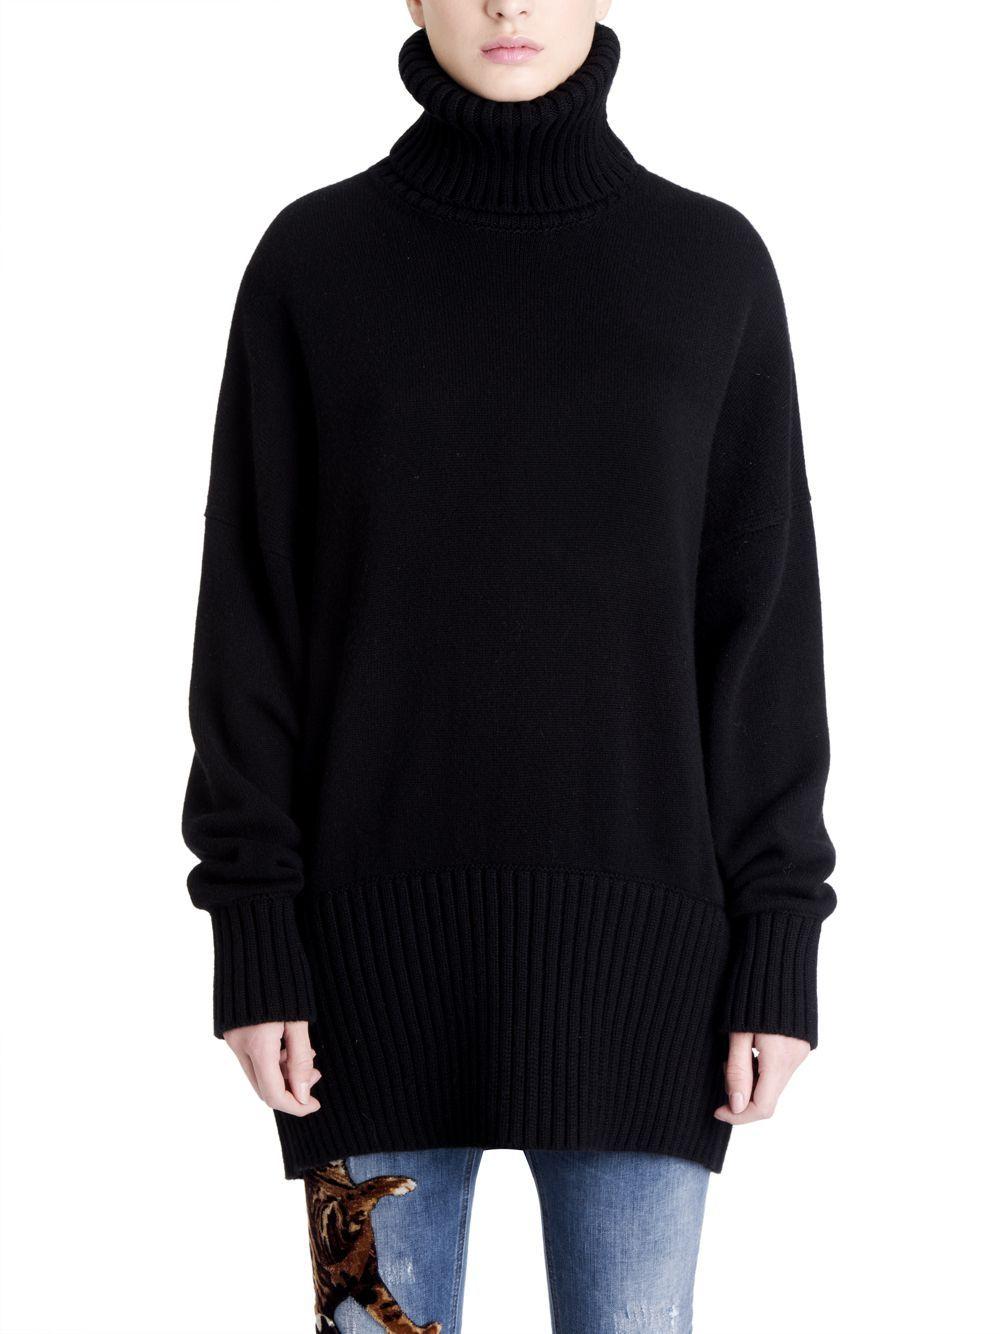 afc615f9a Dolce   Gabbana Oversized Cashmere Turtleneck Sweater